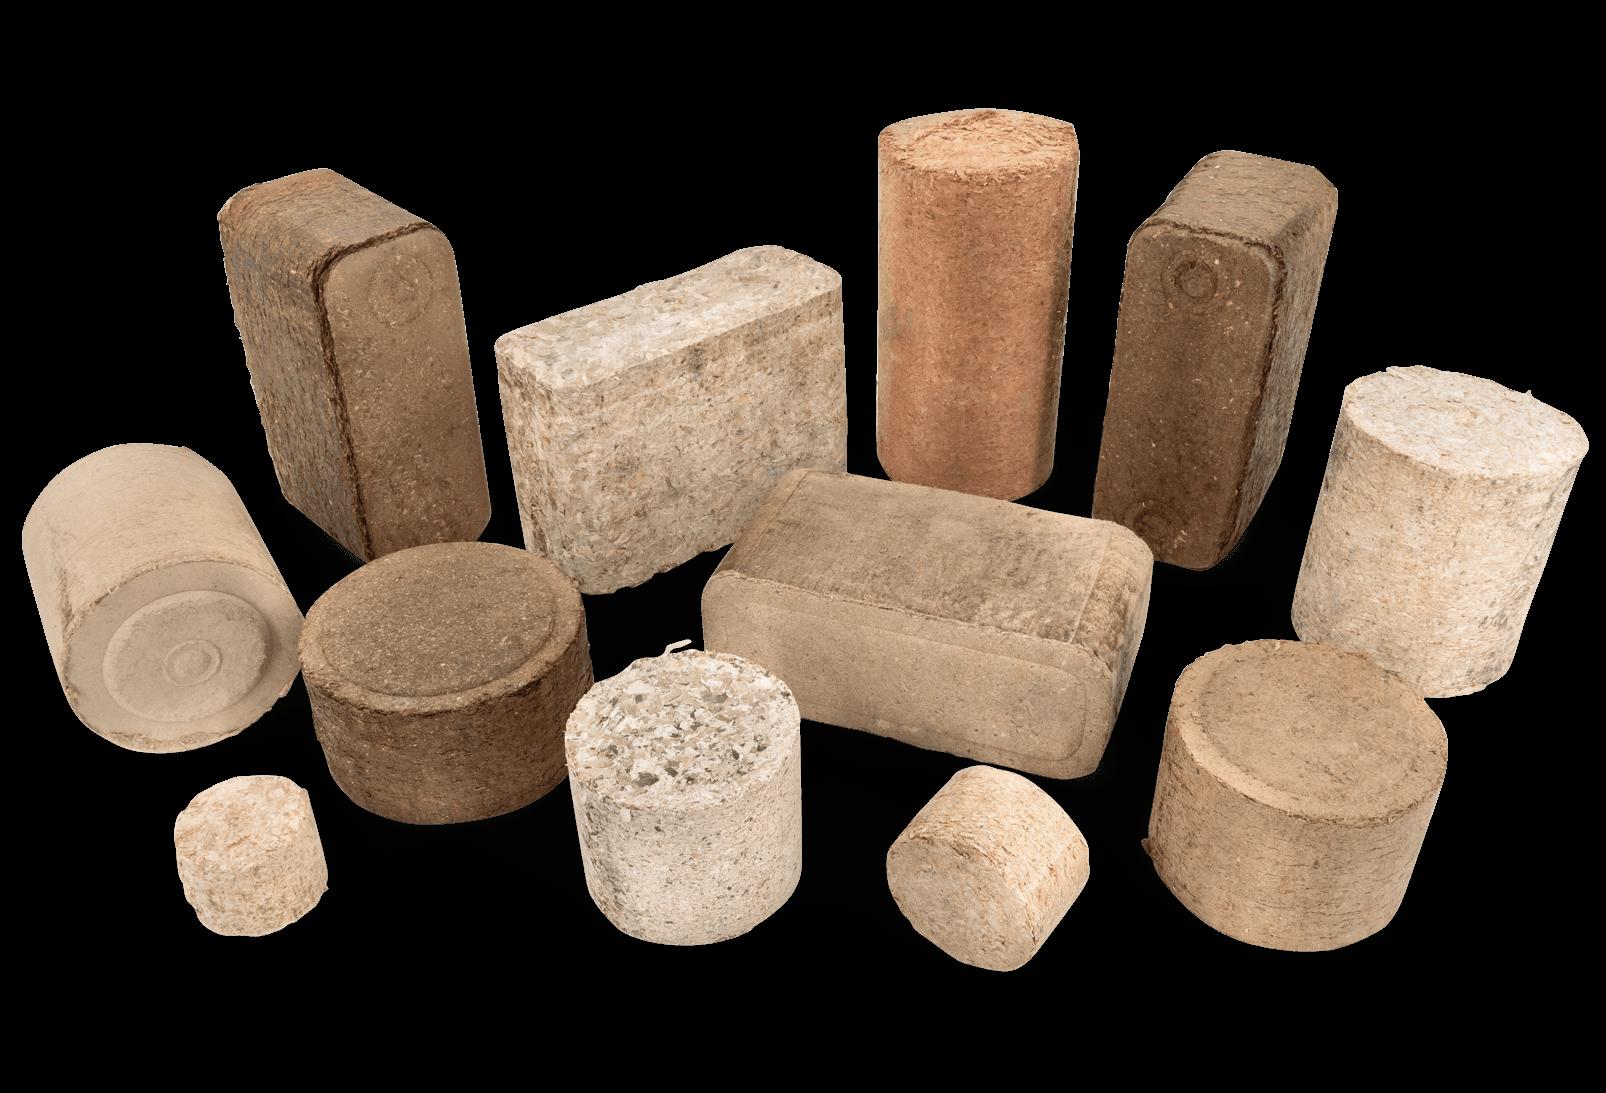 WEIMA wood briquettes round and rectangular